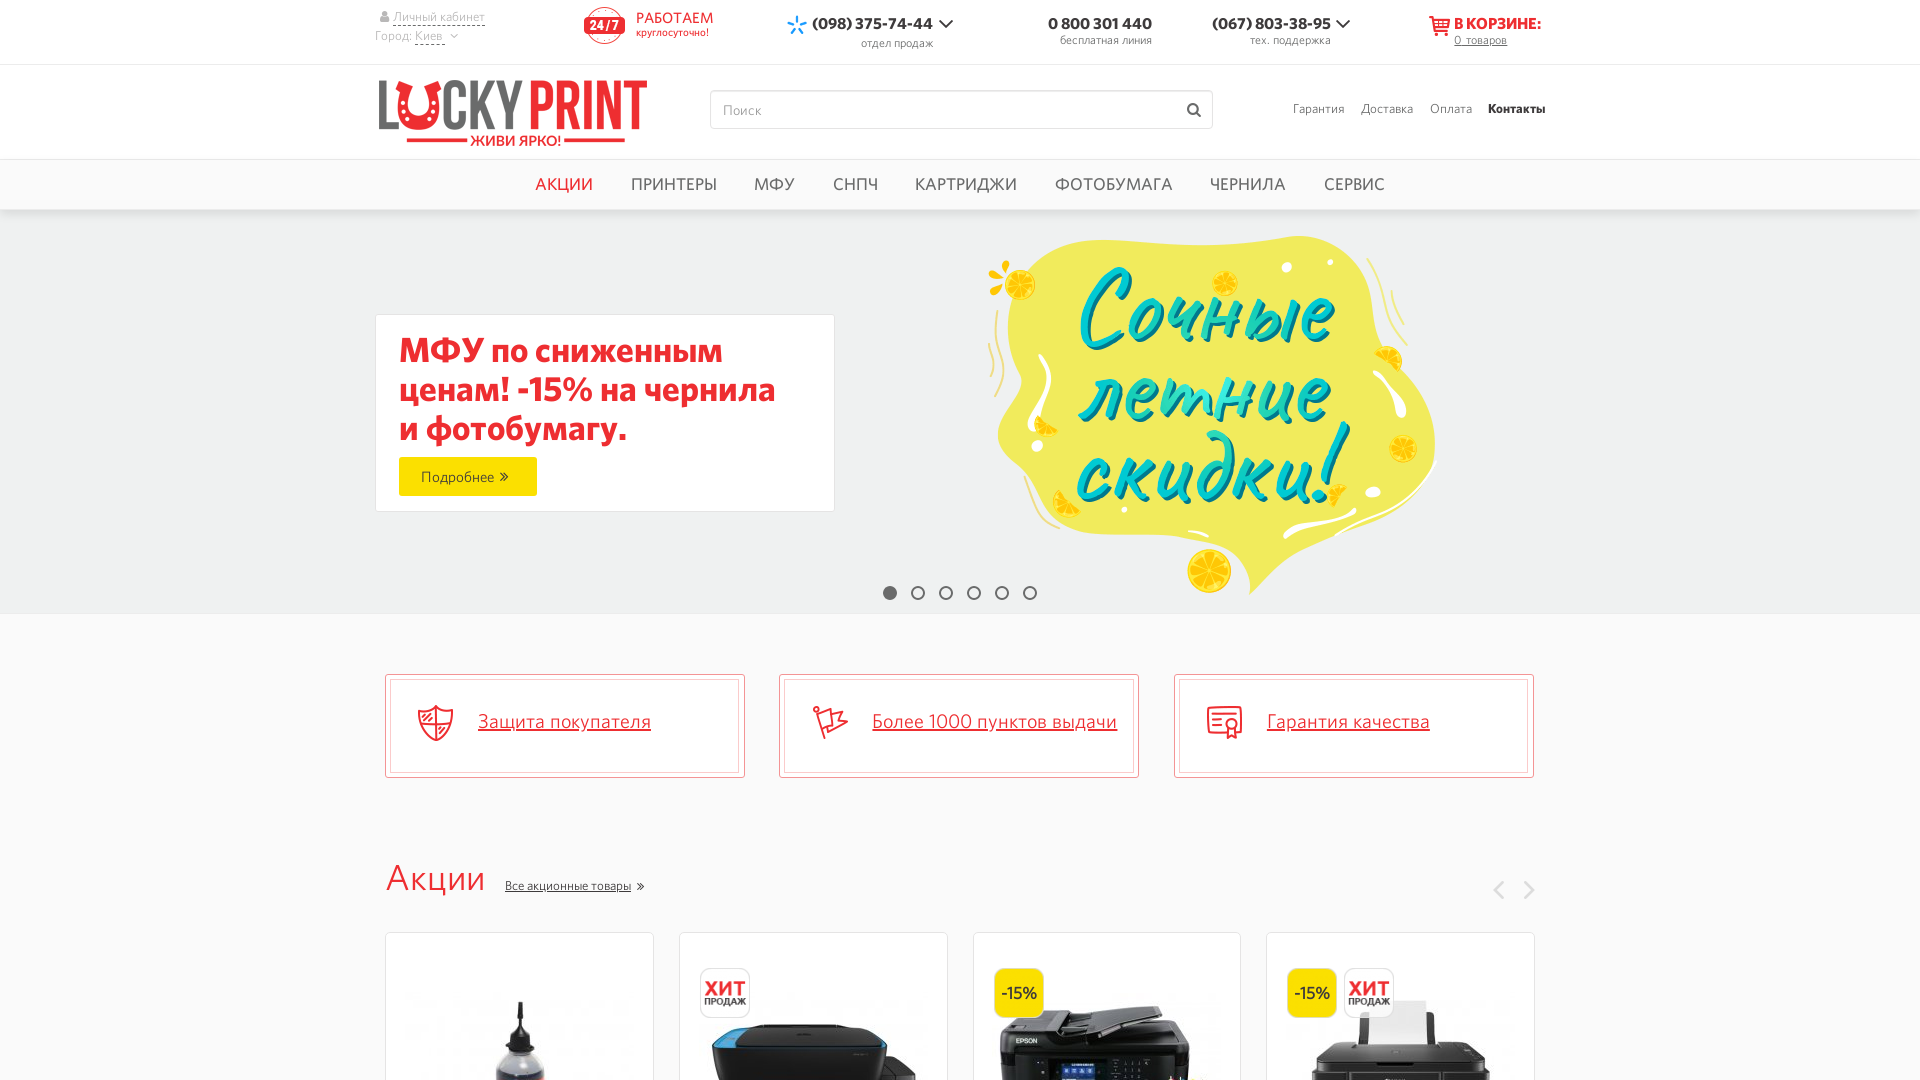 Lucky Print UA website